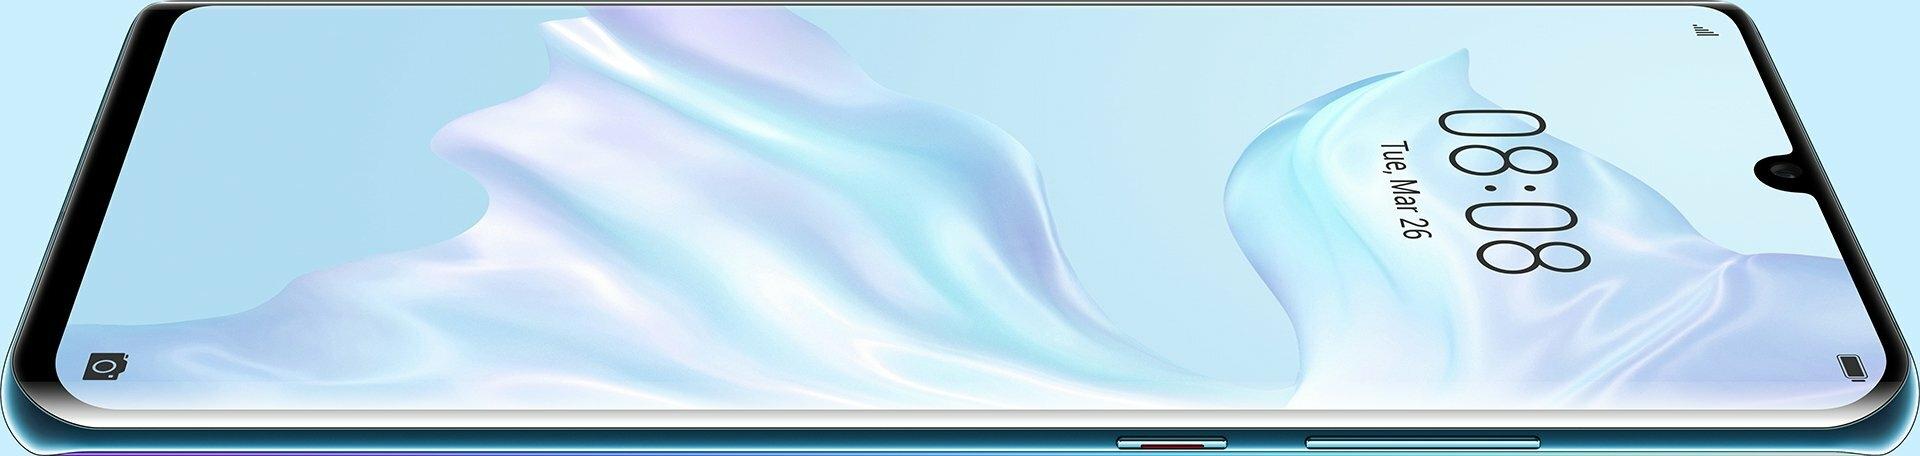 p30 pro dewdrop display